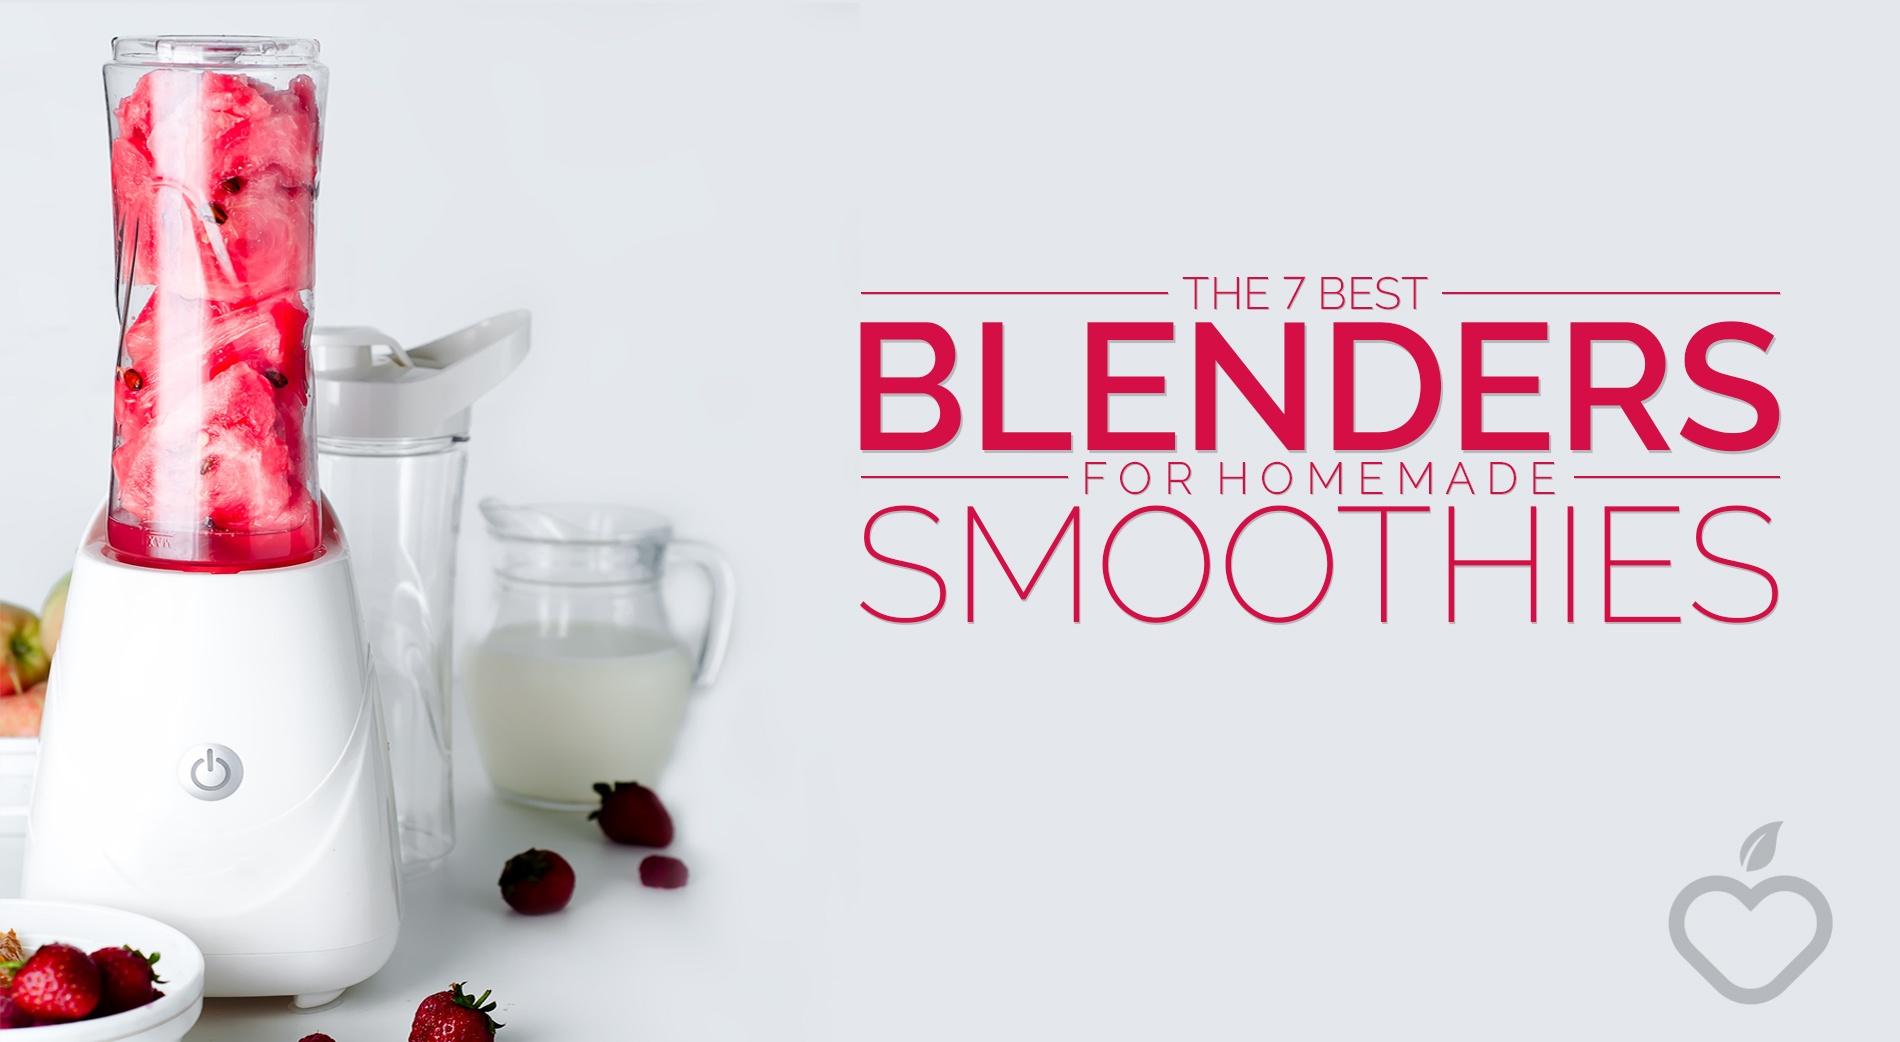 Blenders Image Design 1 - The 7 Best Blenders For Homemade Smoothies